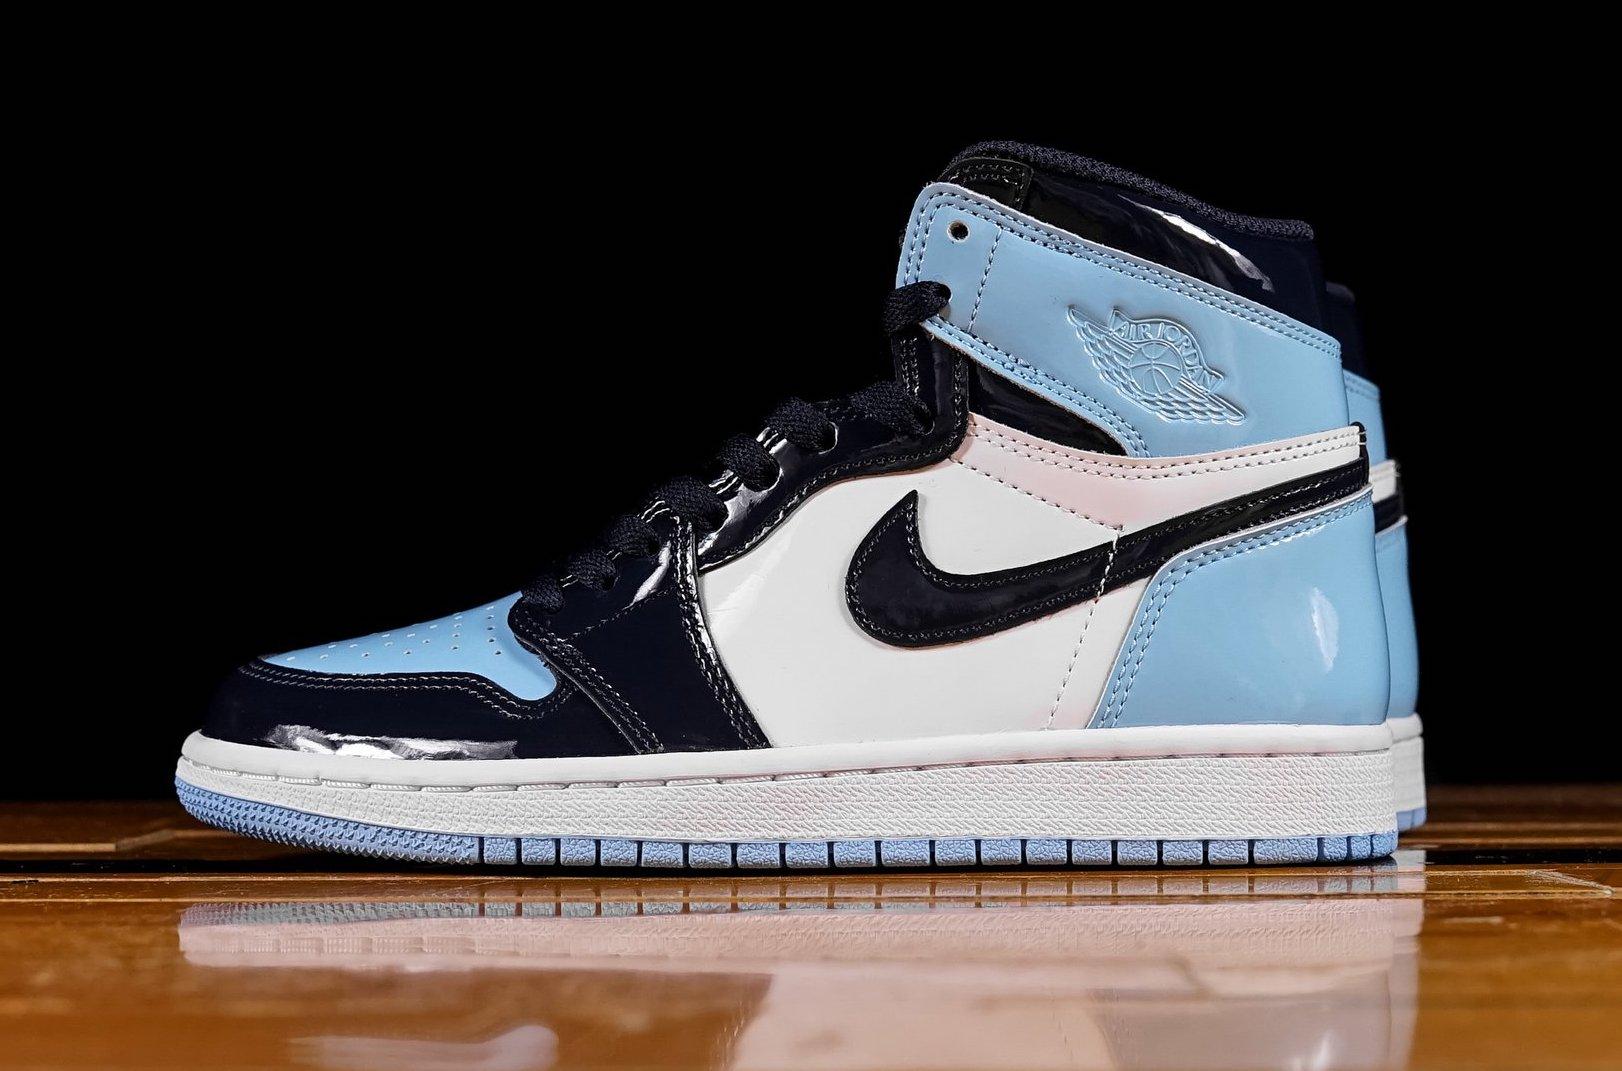 Air Jordan 1 Wmns Retro High Og Unc Patent Blue Chill Dropping